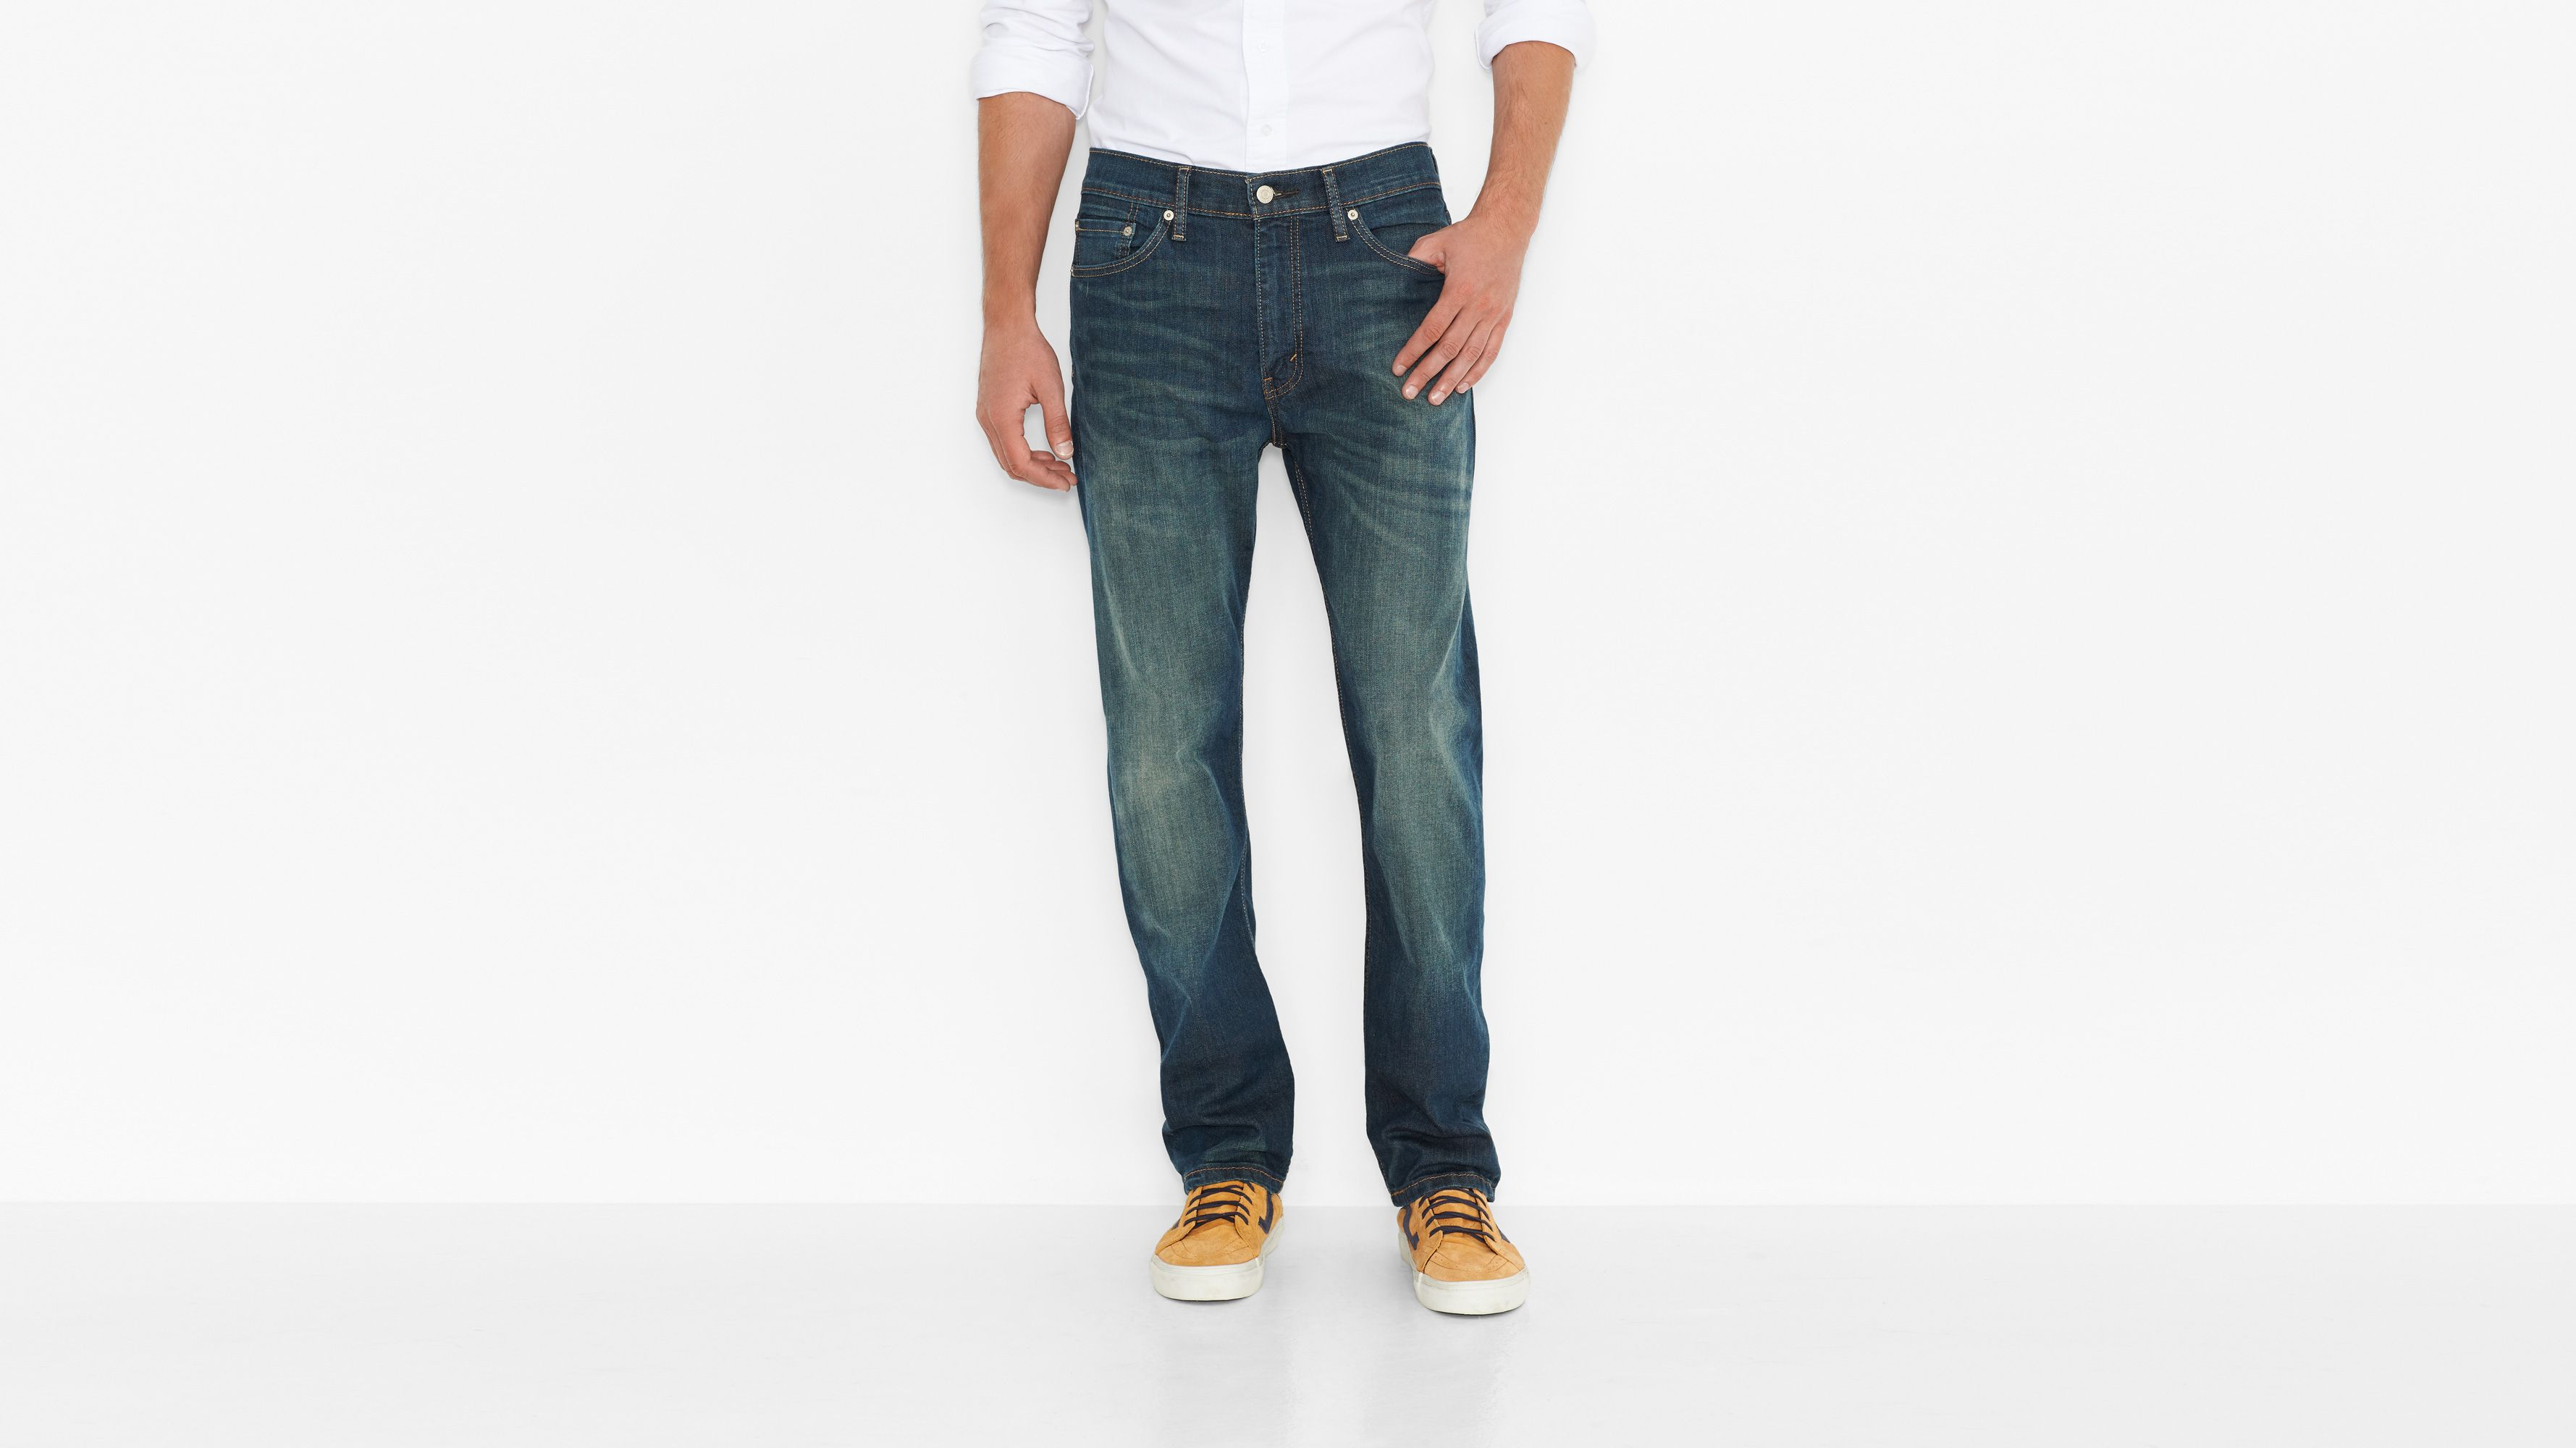 513™ Slim Straight Jeans - Cash